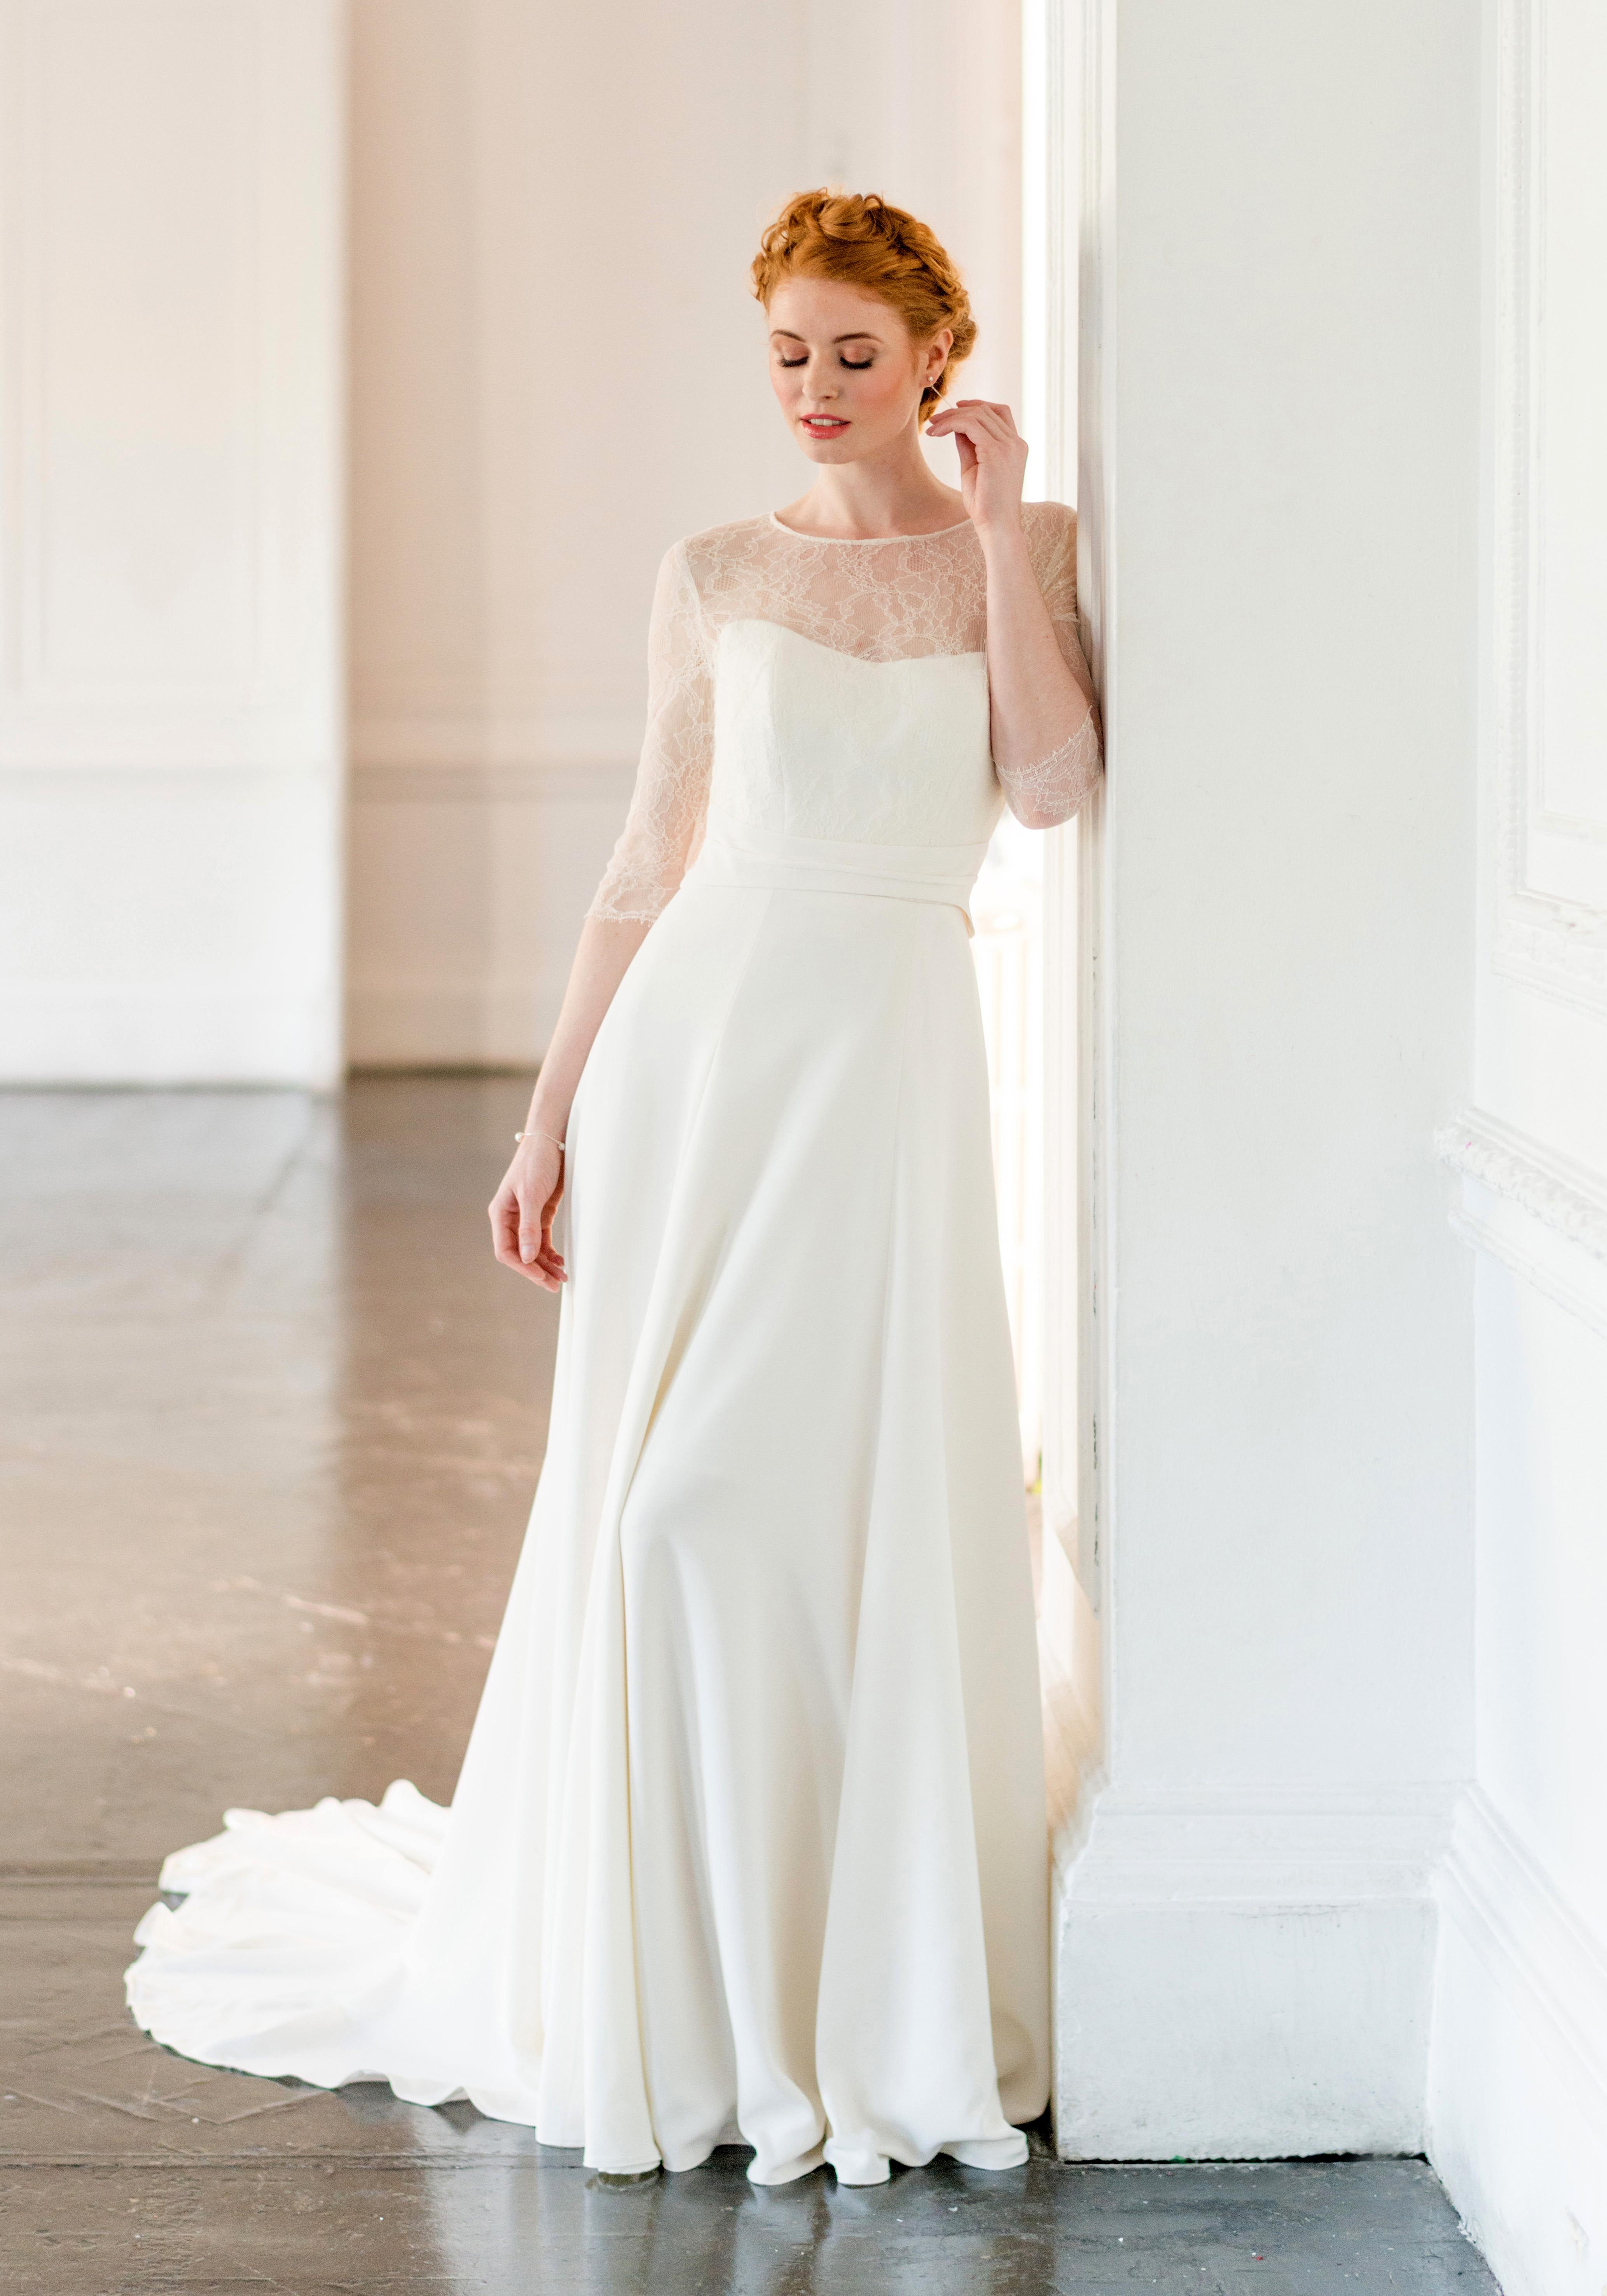 Naomi Neoh Wedding Dress Sale - Cicily Bridal